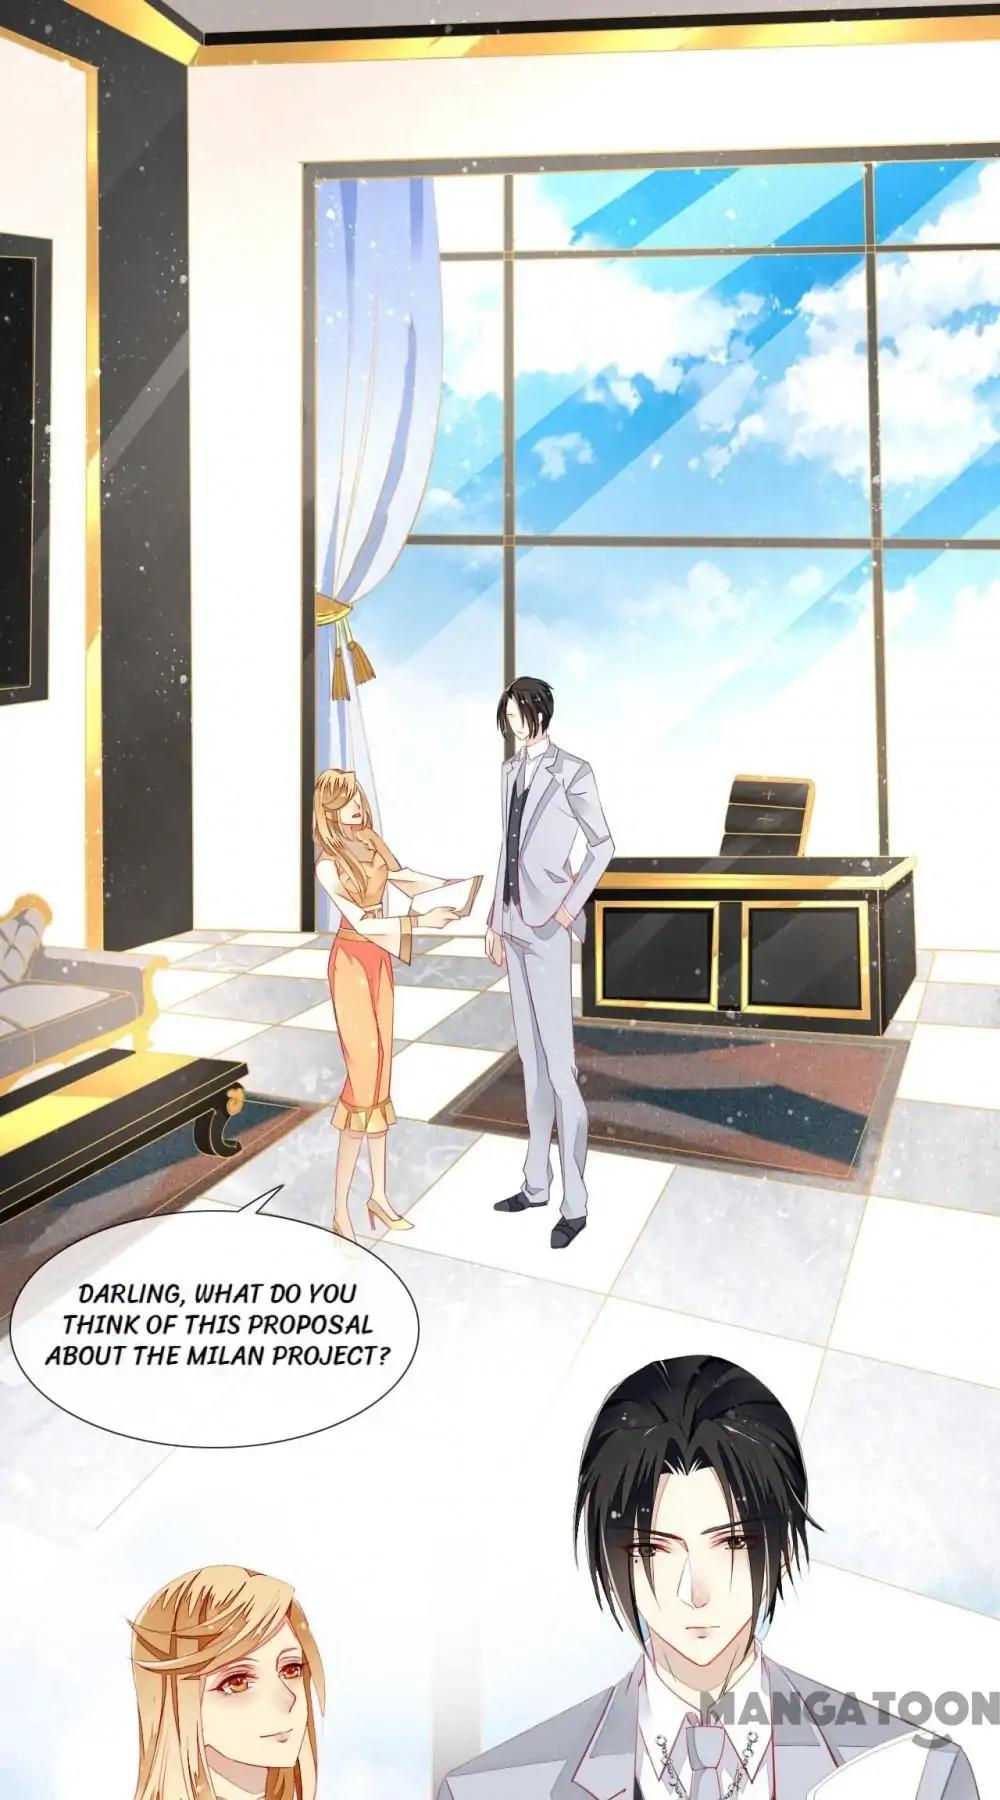 https://img2.nineanime.com/comics/pic2/4/33220/969556/eca89c0554ce99eaf250504971789ede.jpg Page 1